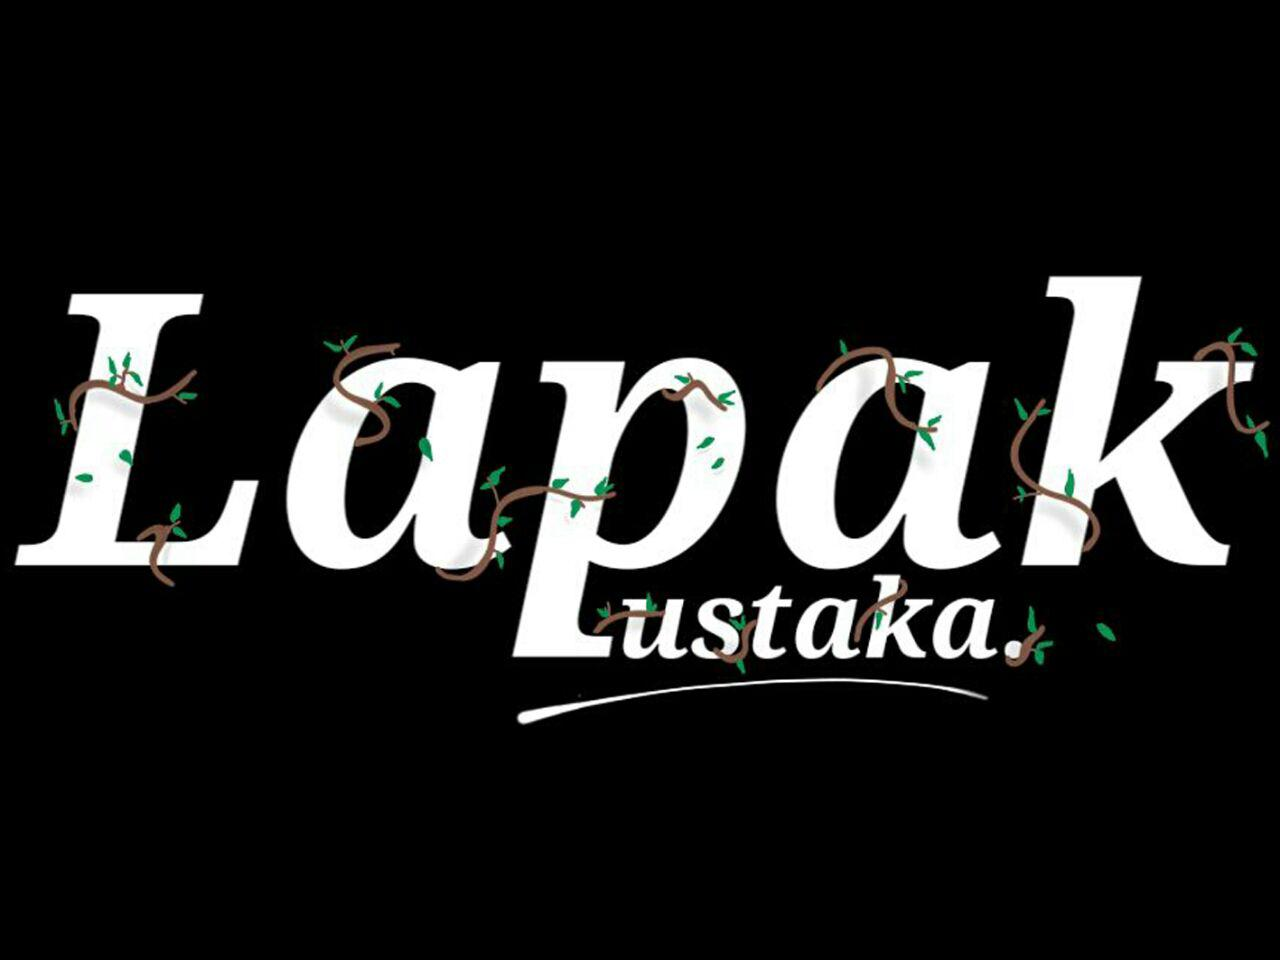 Lapak Pustaka, Komunitas Milenial Penyebar Semangat Literasi